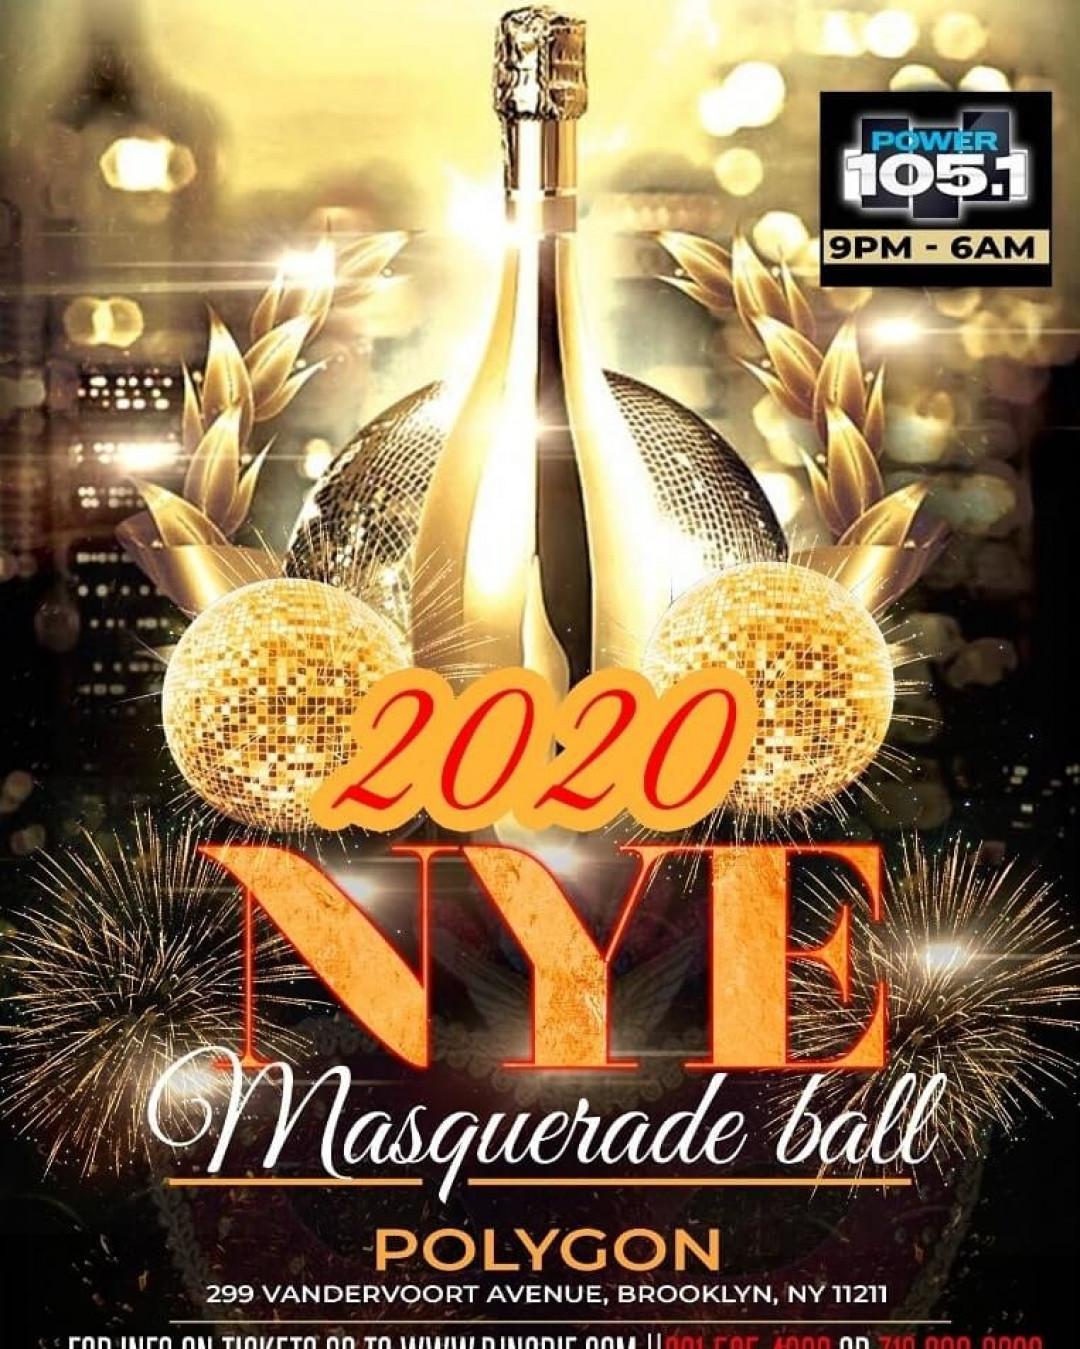 POWER 105.1FM NYE MASQUERADE